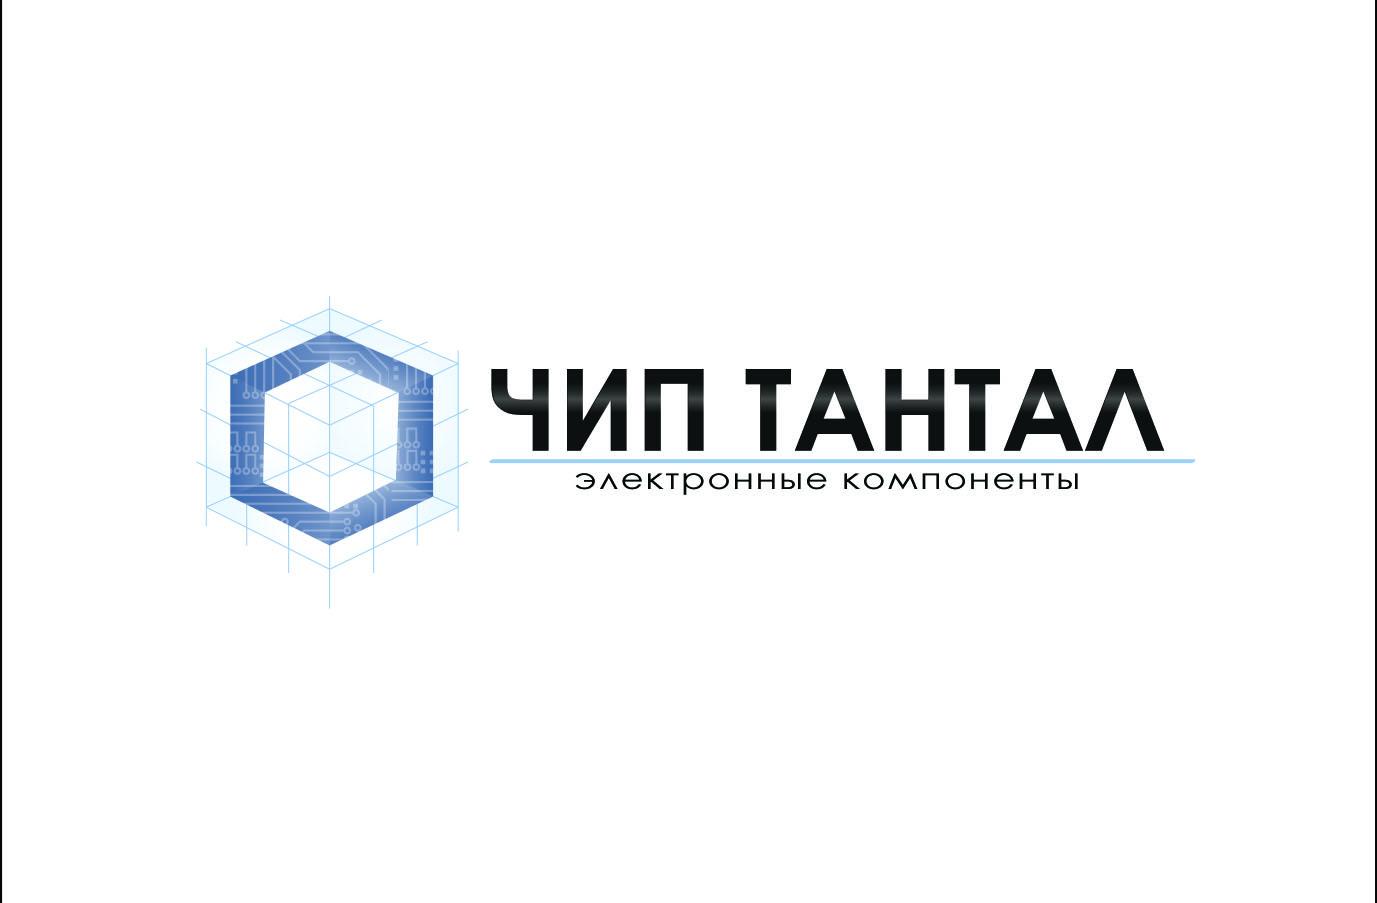 Логотип + Дизайн настольного календаря фото f_9155a2810e7c6bcd.jpg